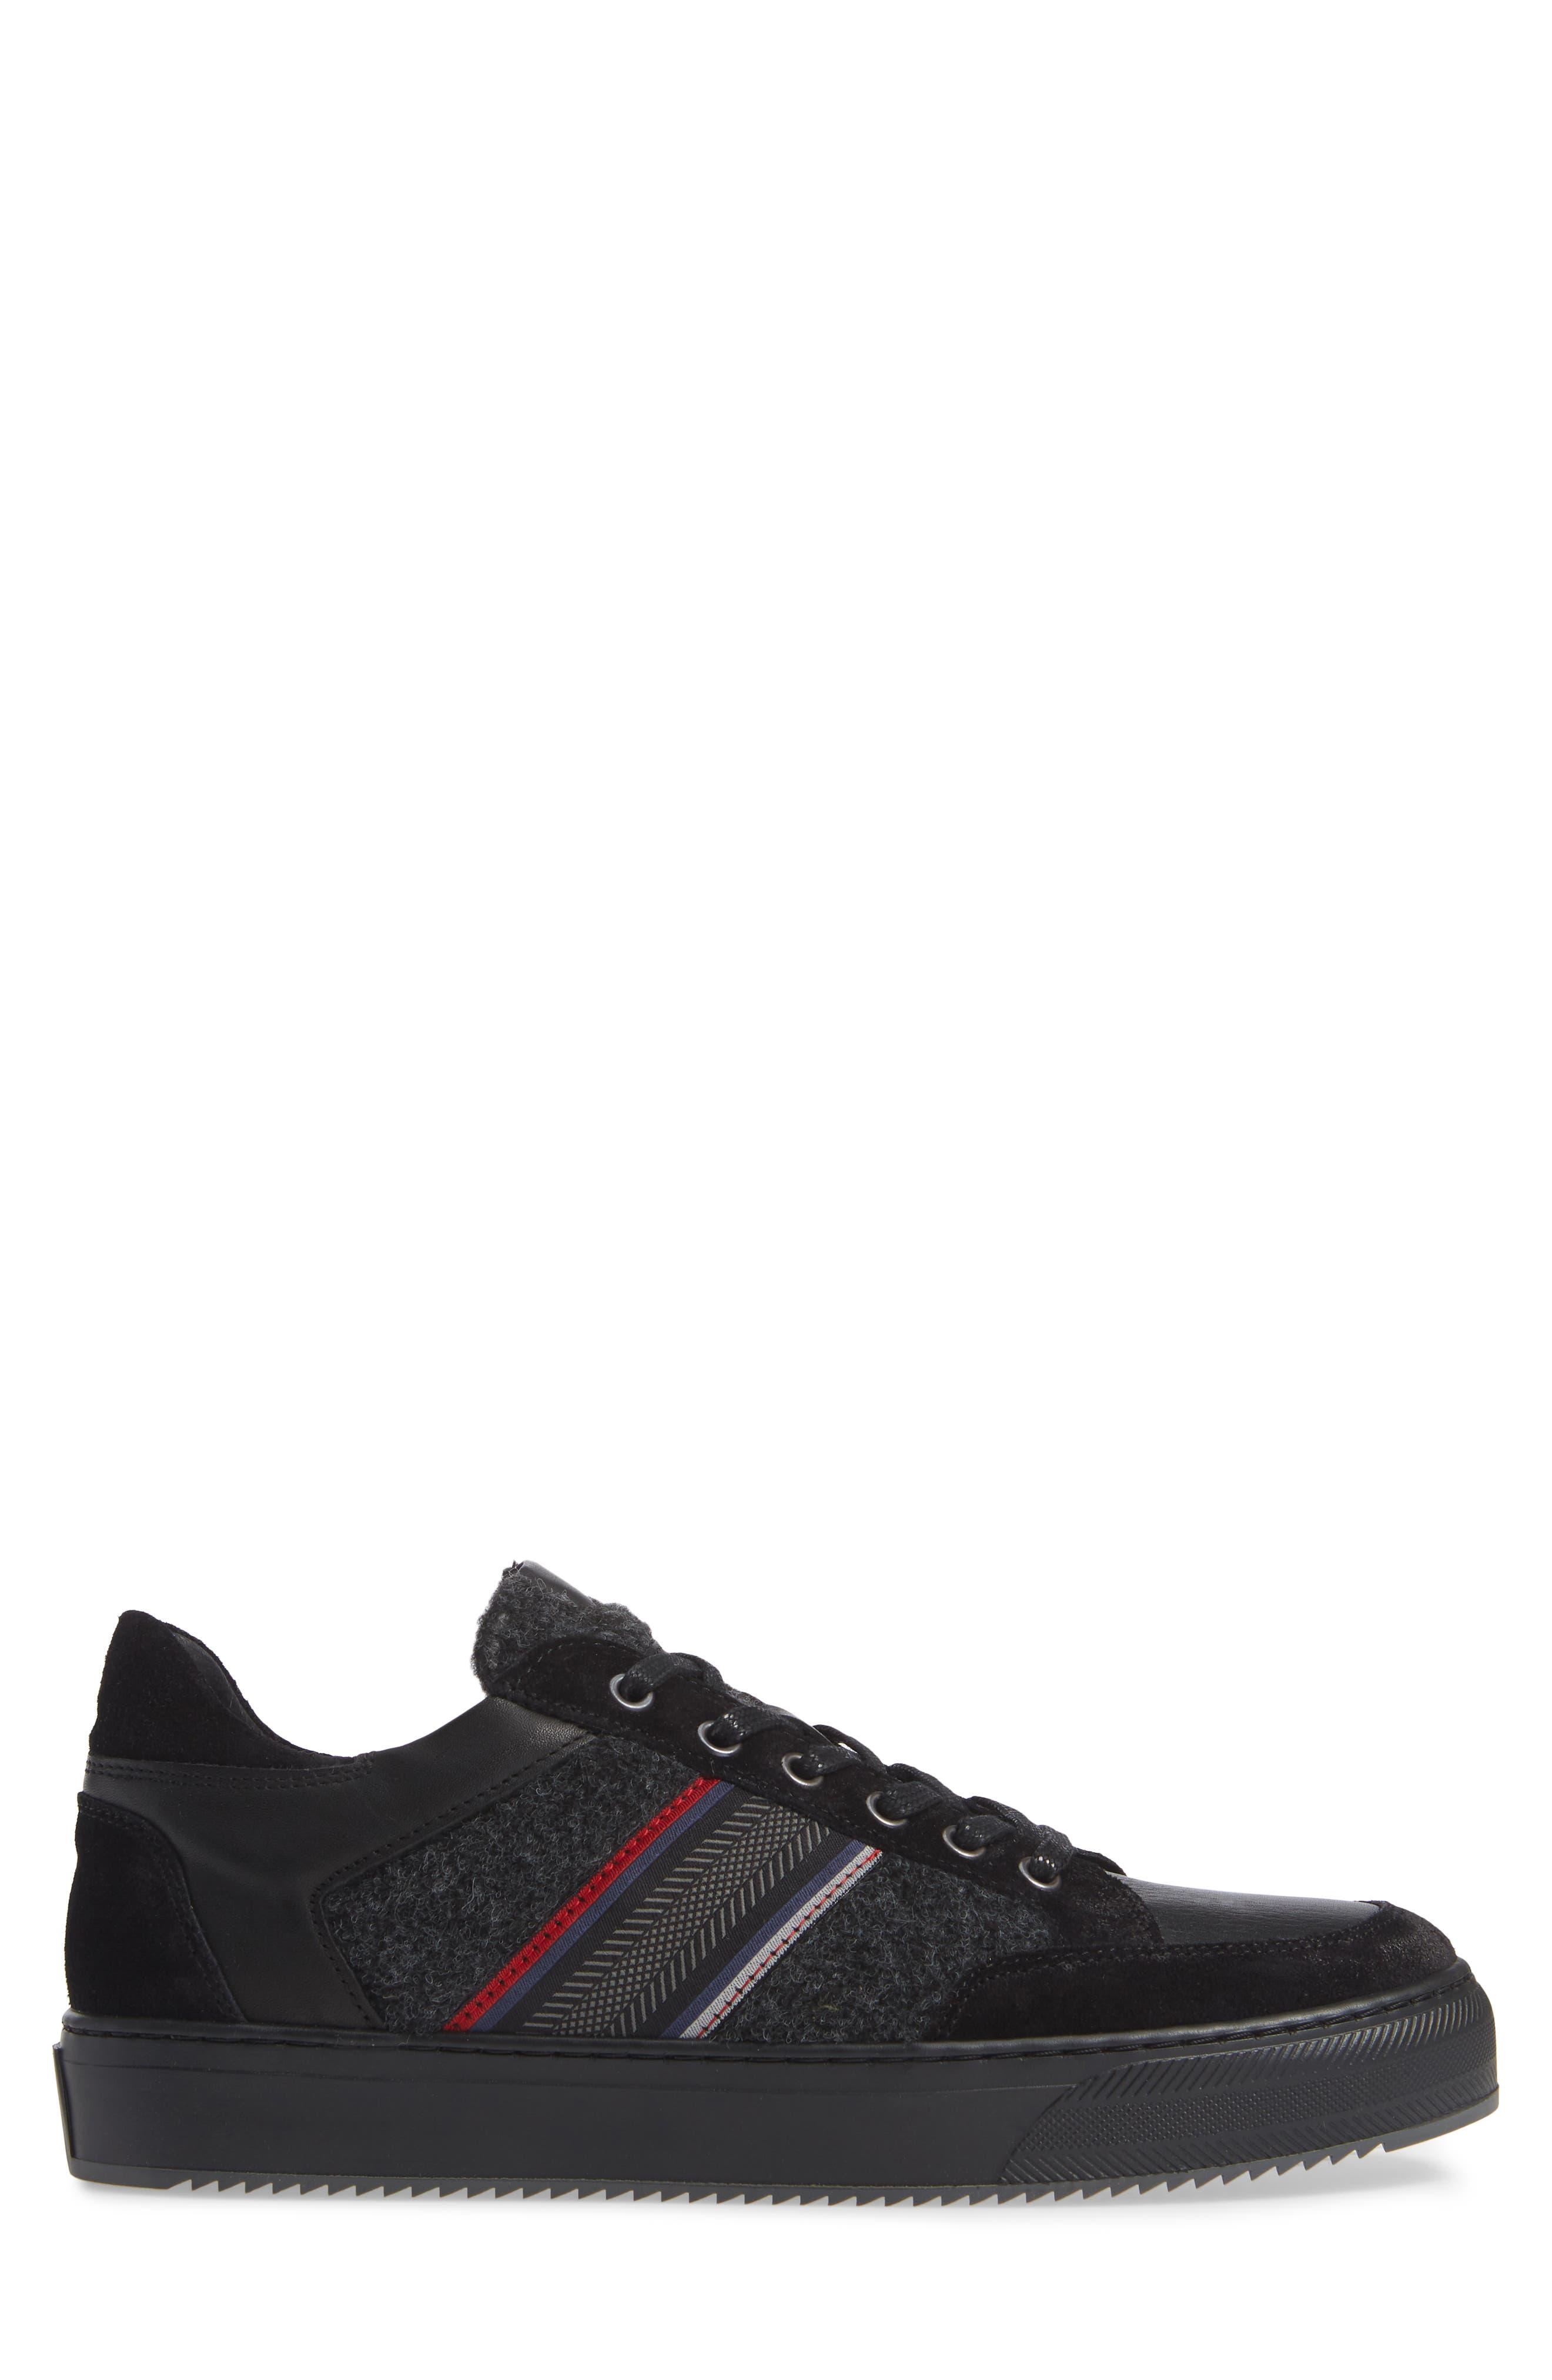 Poggio Sneaker,                             Alternate thumbnail 3, color,                             BLACK